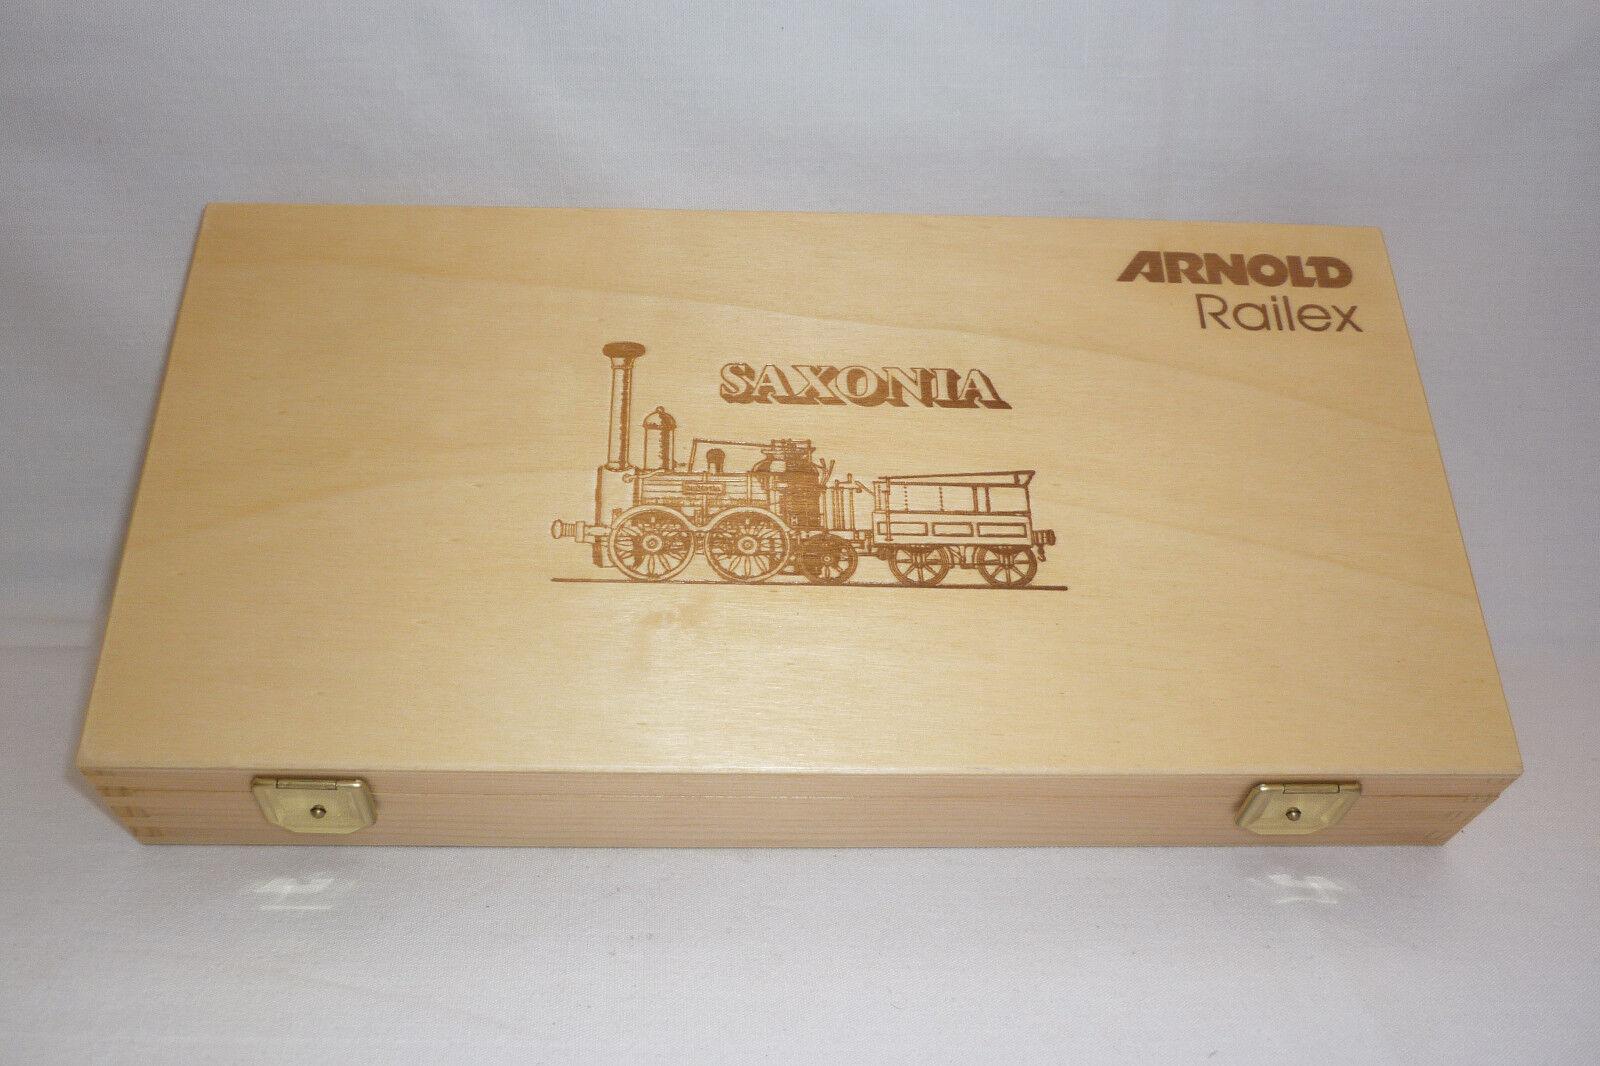 Arnold - scala N - modellkoffer SASSONIA modellino ferrovia - conf. orig. -